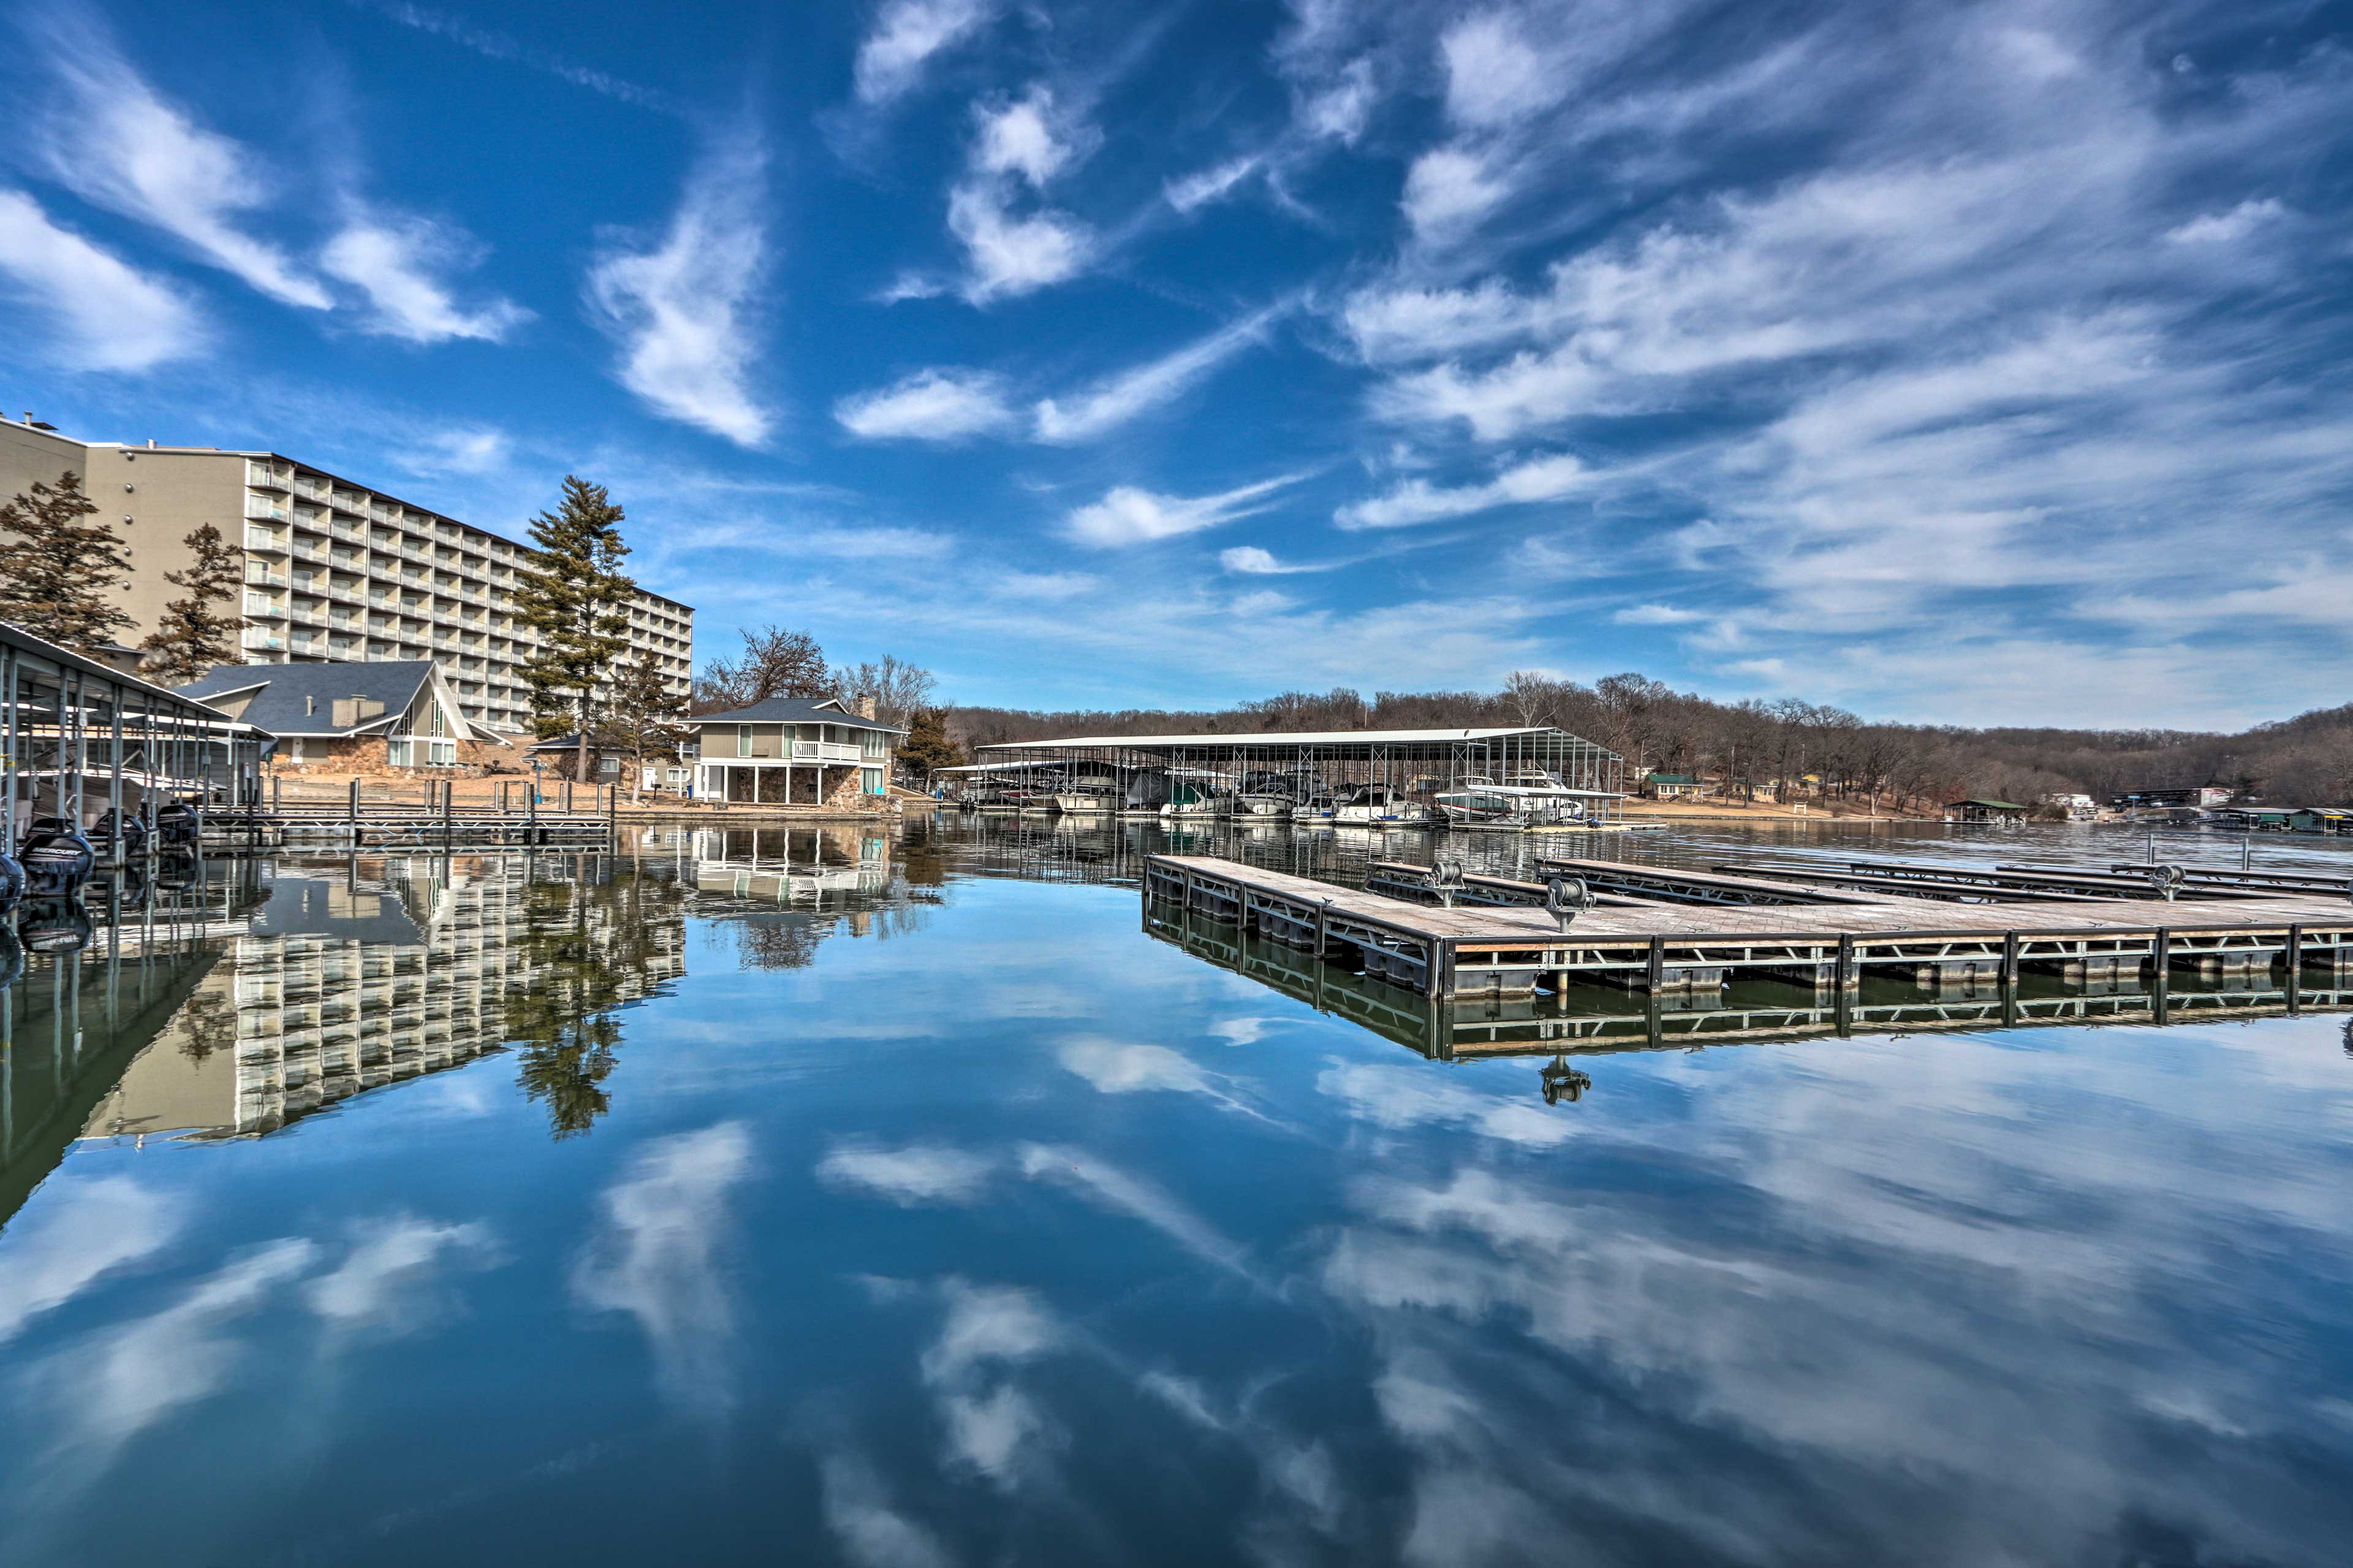 Margaritaville Lake Resort